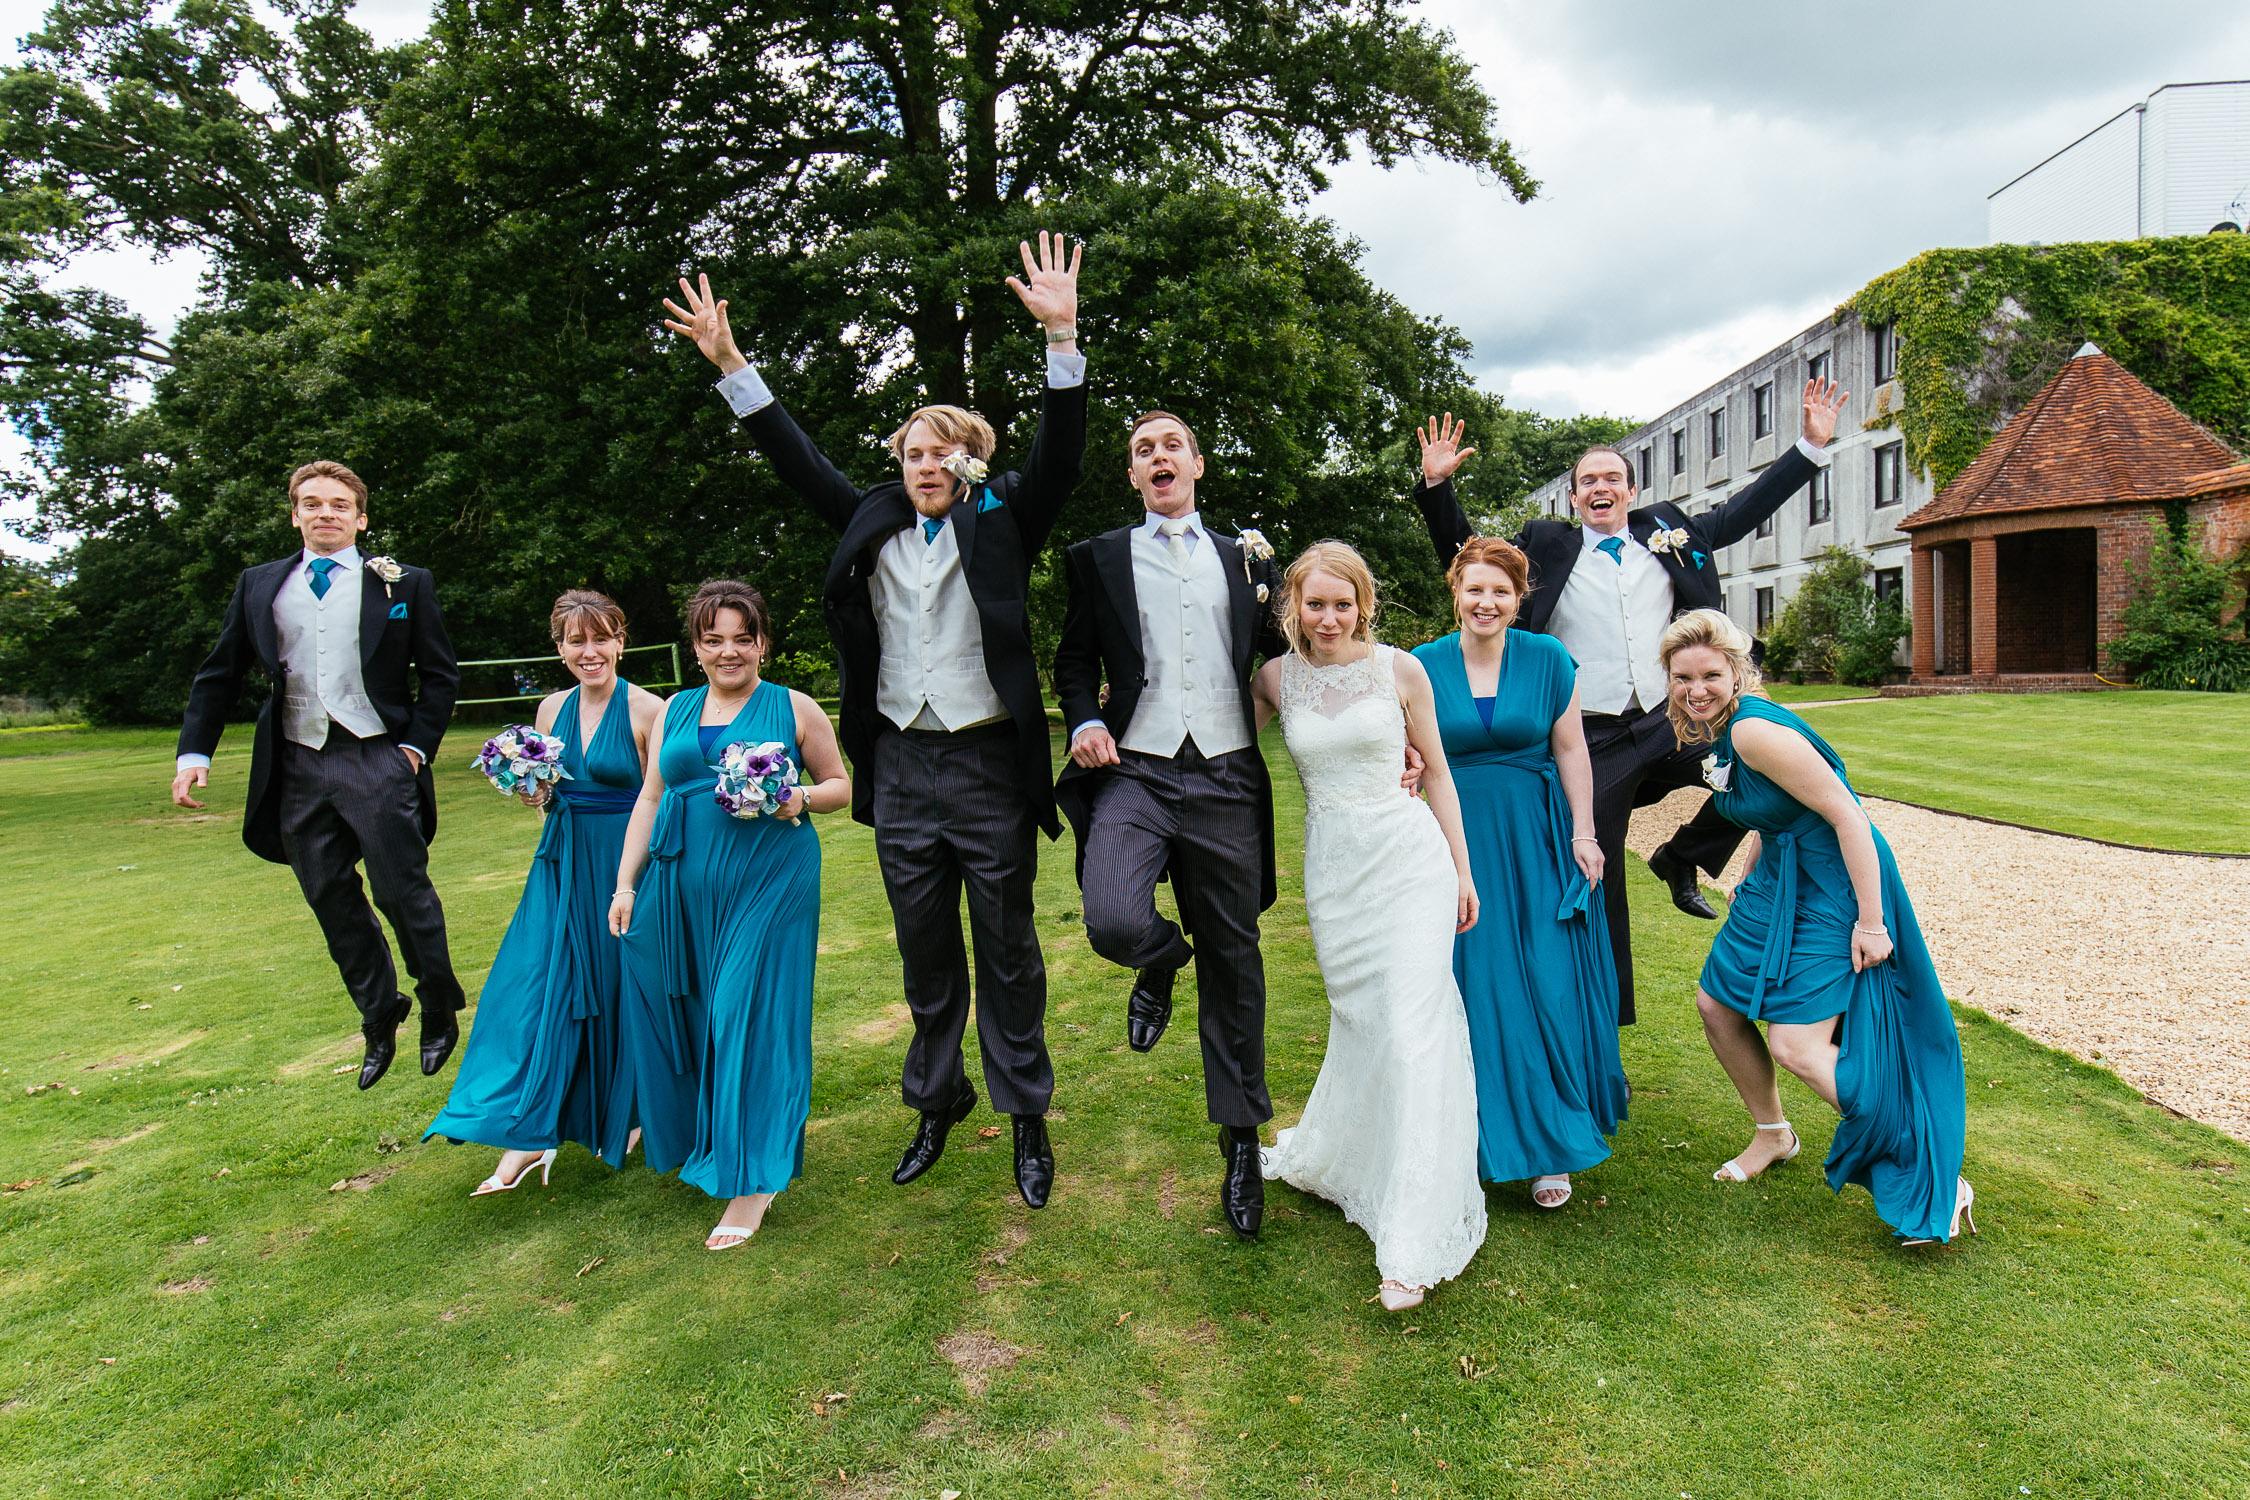 Lizi-and-Mark-Wedding-Highlights-58.jpg